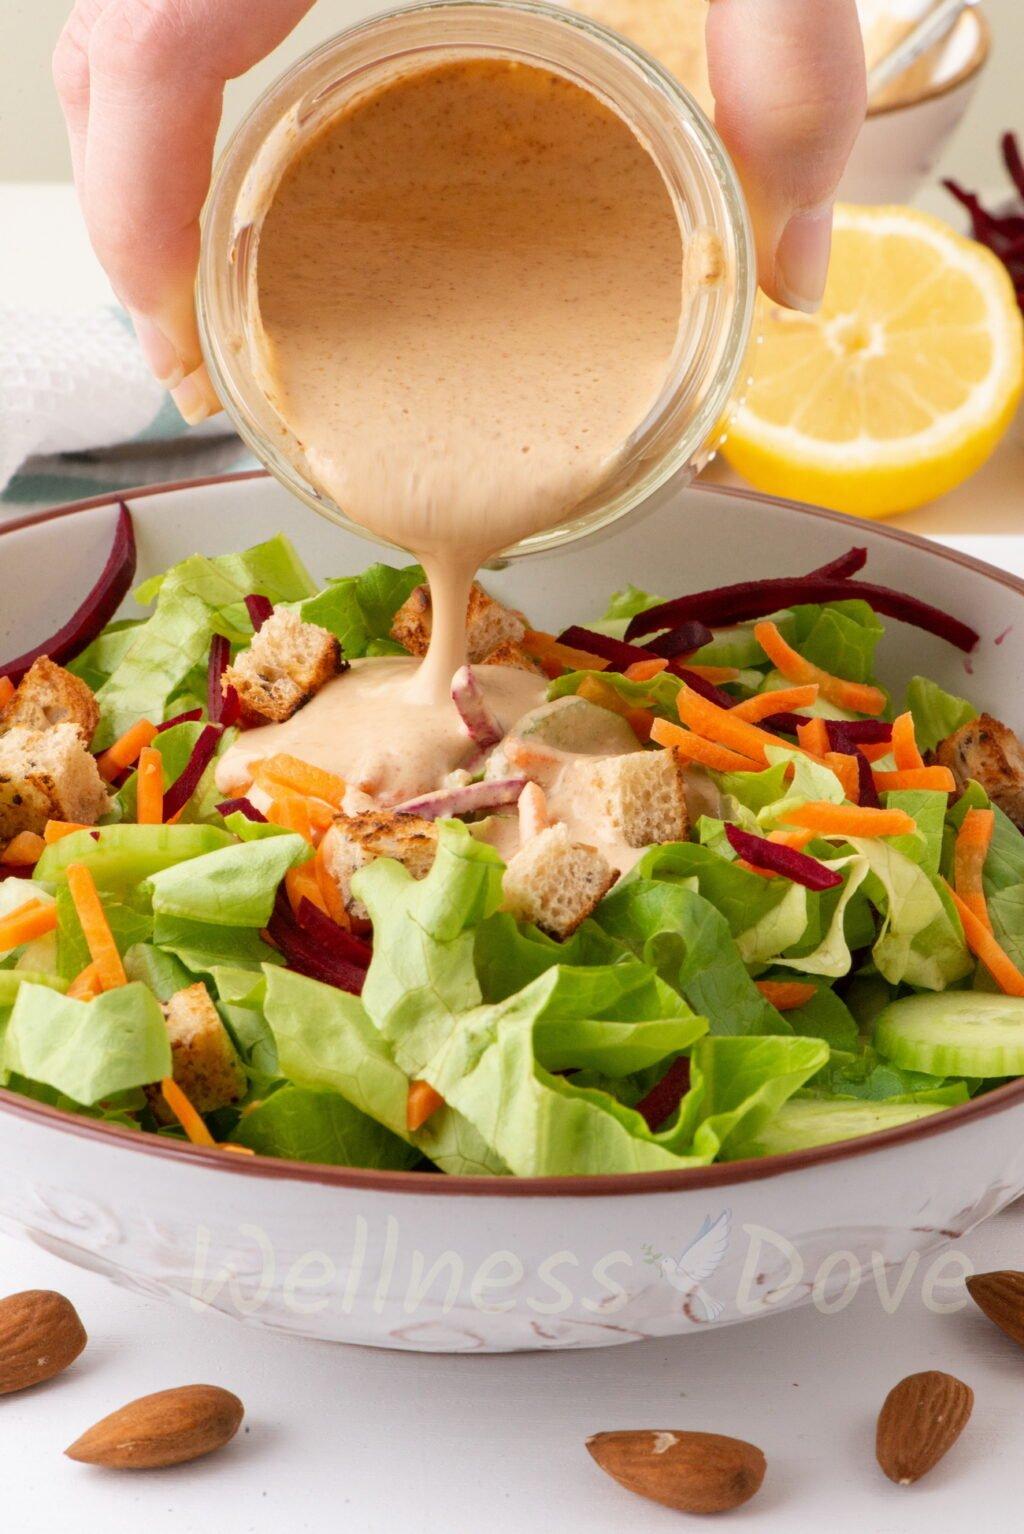 seasoning a salad with vegan dressing